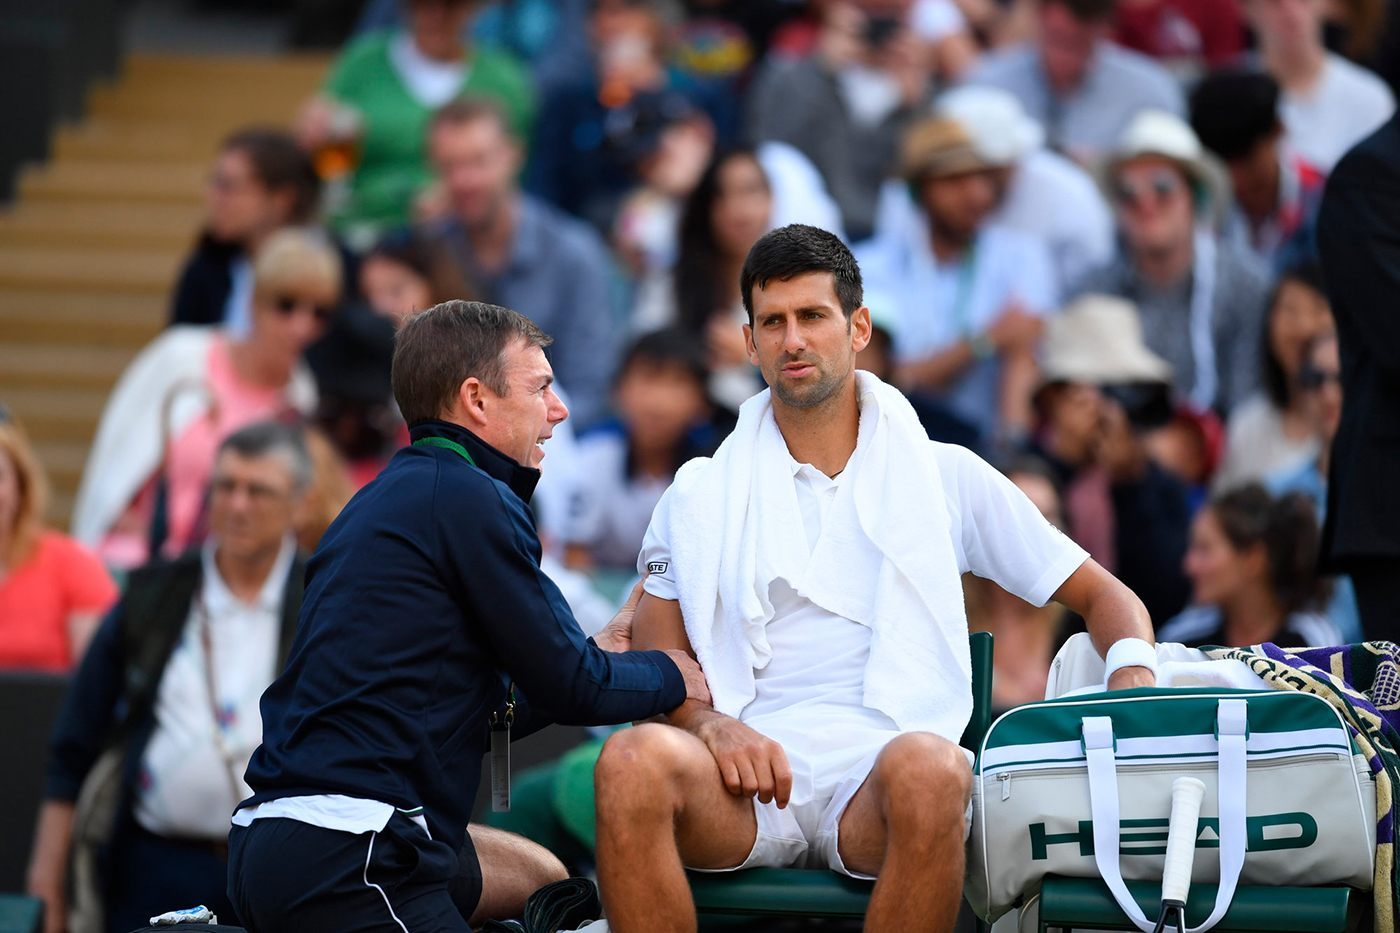 Djokovic antes de retirarse ante Berdych